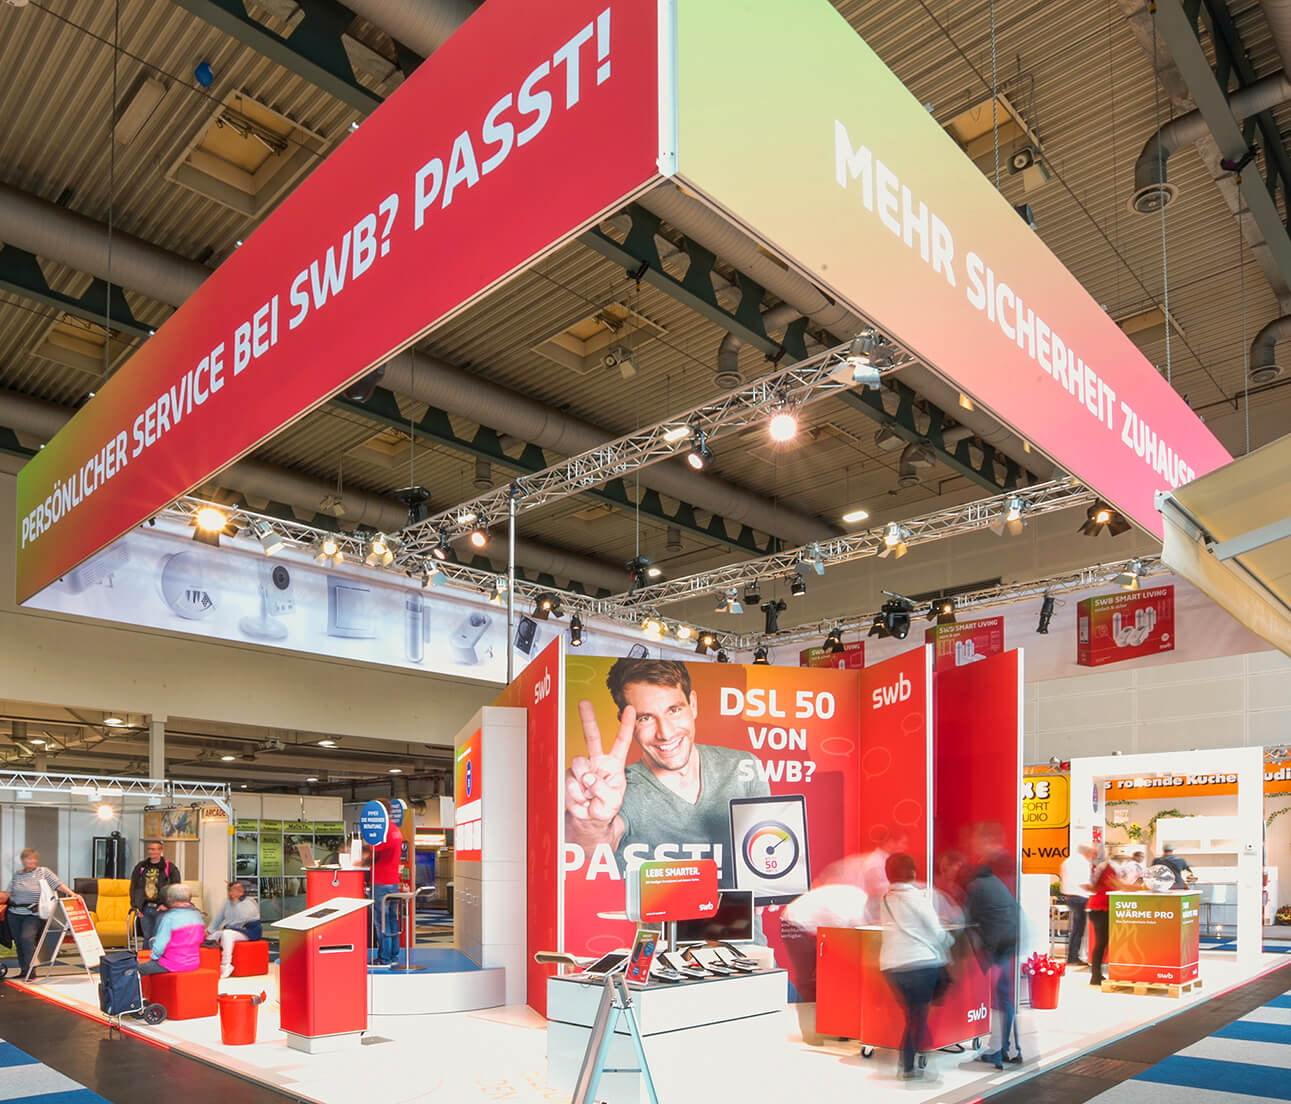 Anka Werbung - Messebau Bremen - swb Hanselife 2017